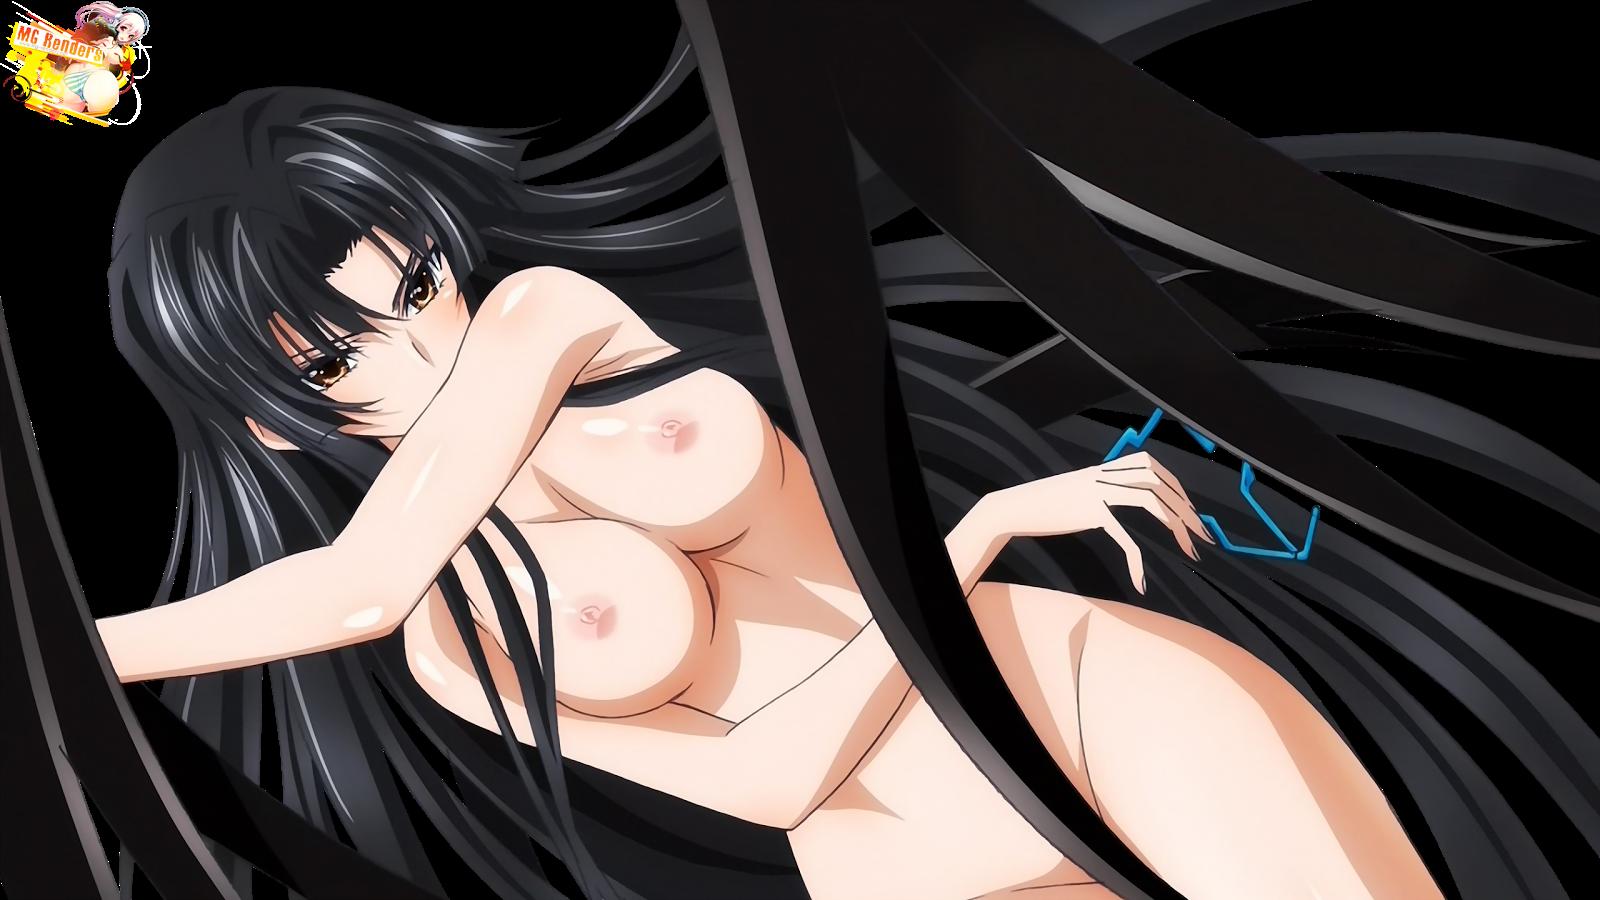 High School DxD - Shinra Tsubaki Render 1